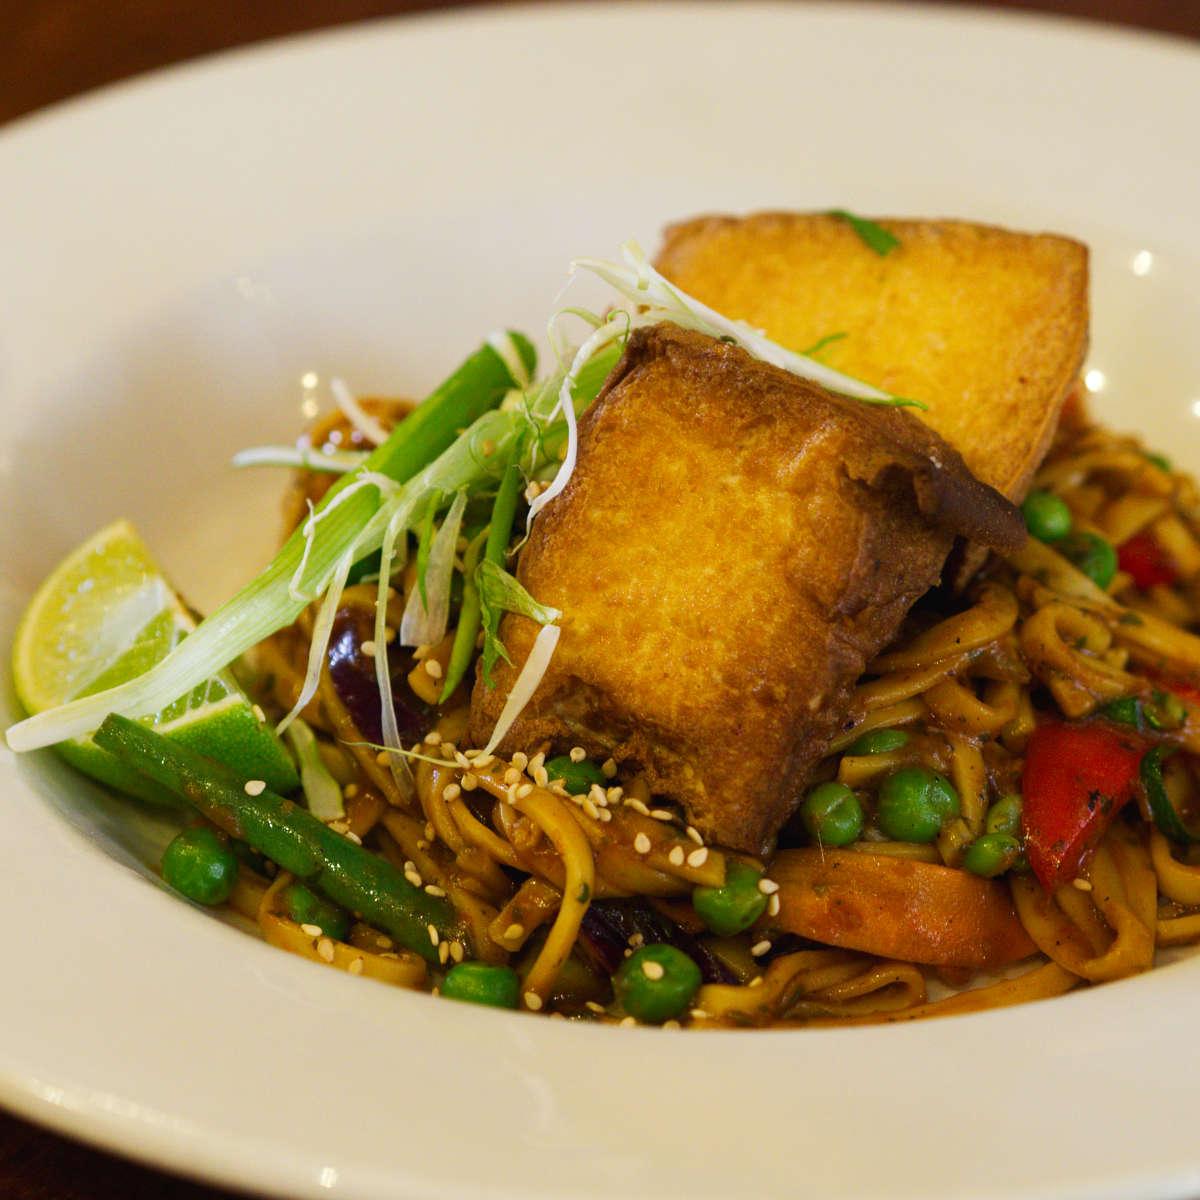 Vegan tofu and noodles at David Bann, Edinburgh